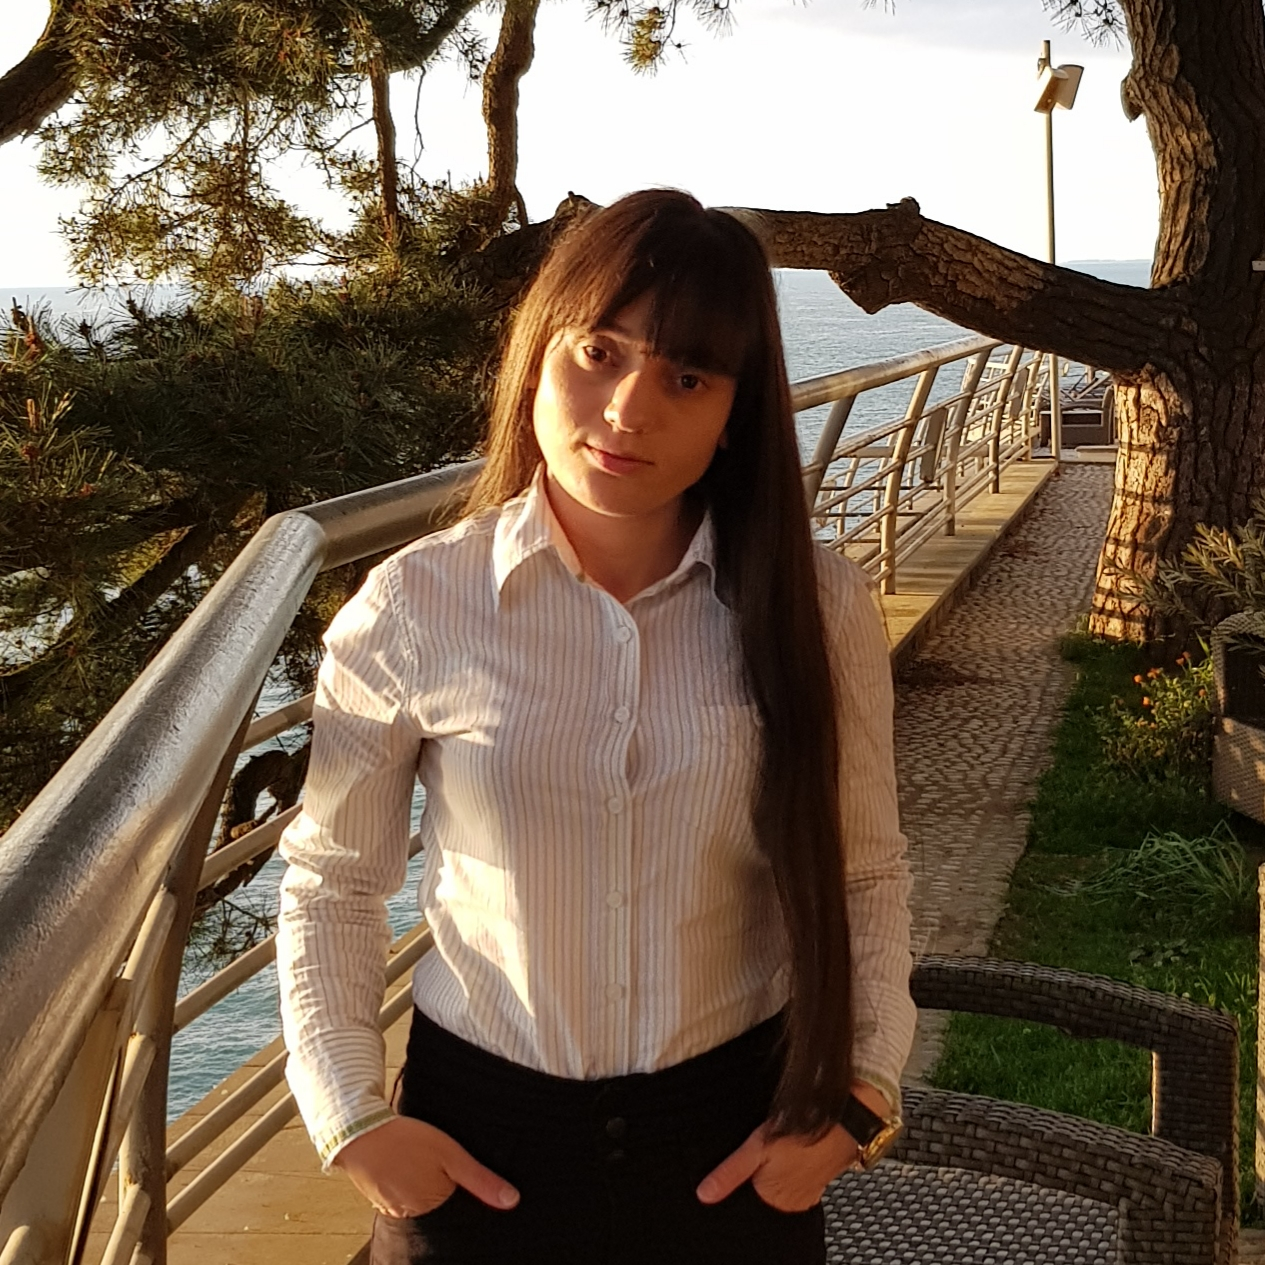 freelance tour guide მარიამ მიქელაძე